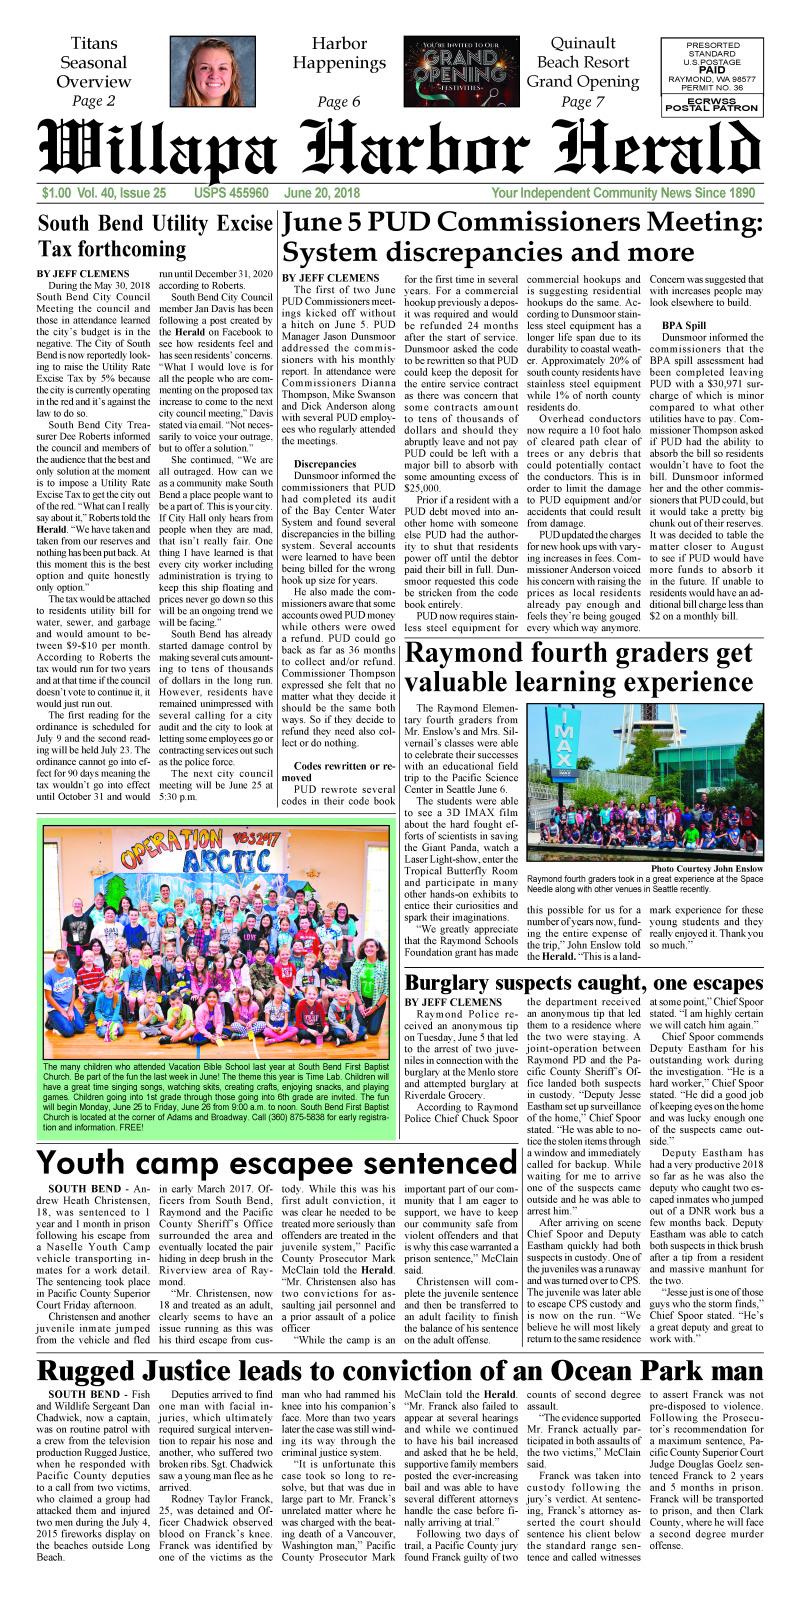 June 20, 2018 Willapa Harbor Herald